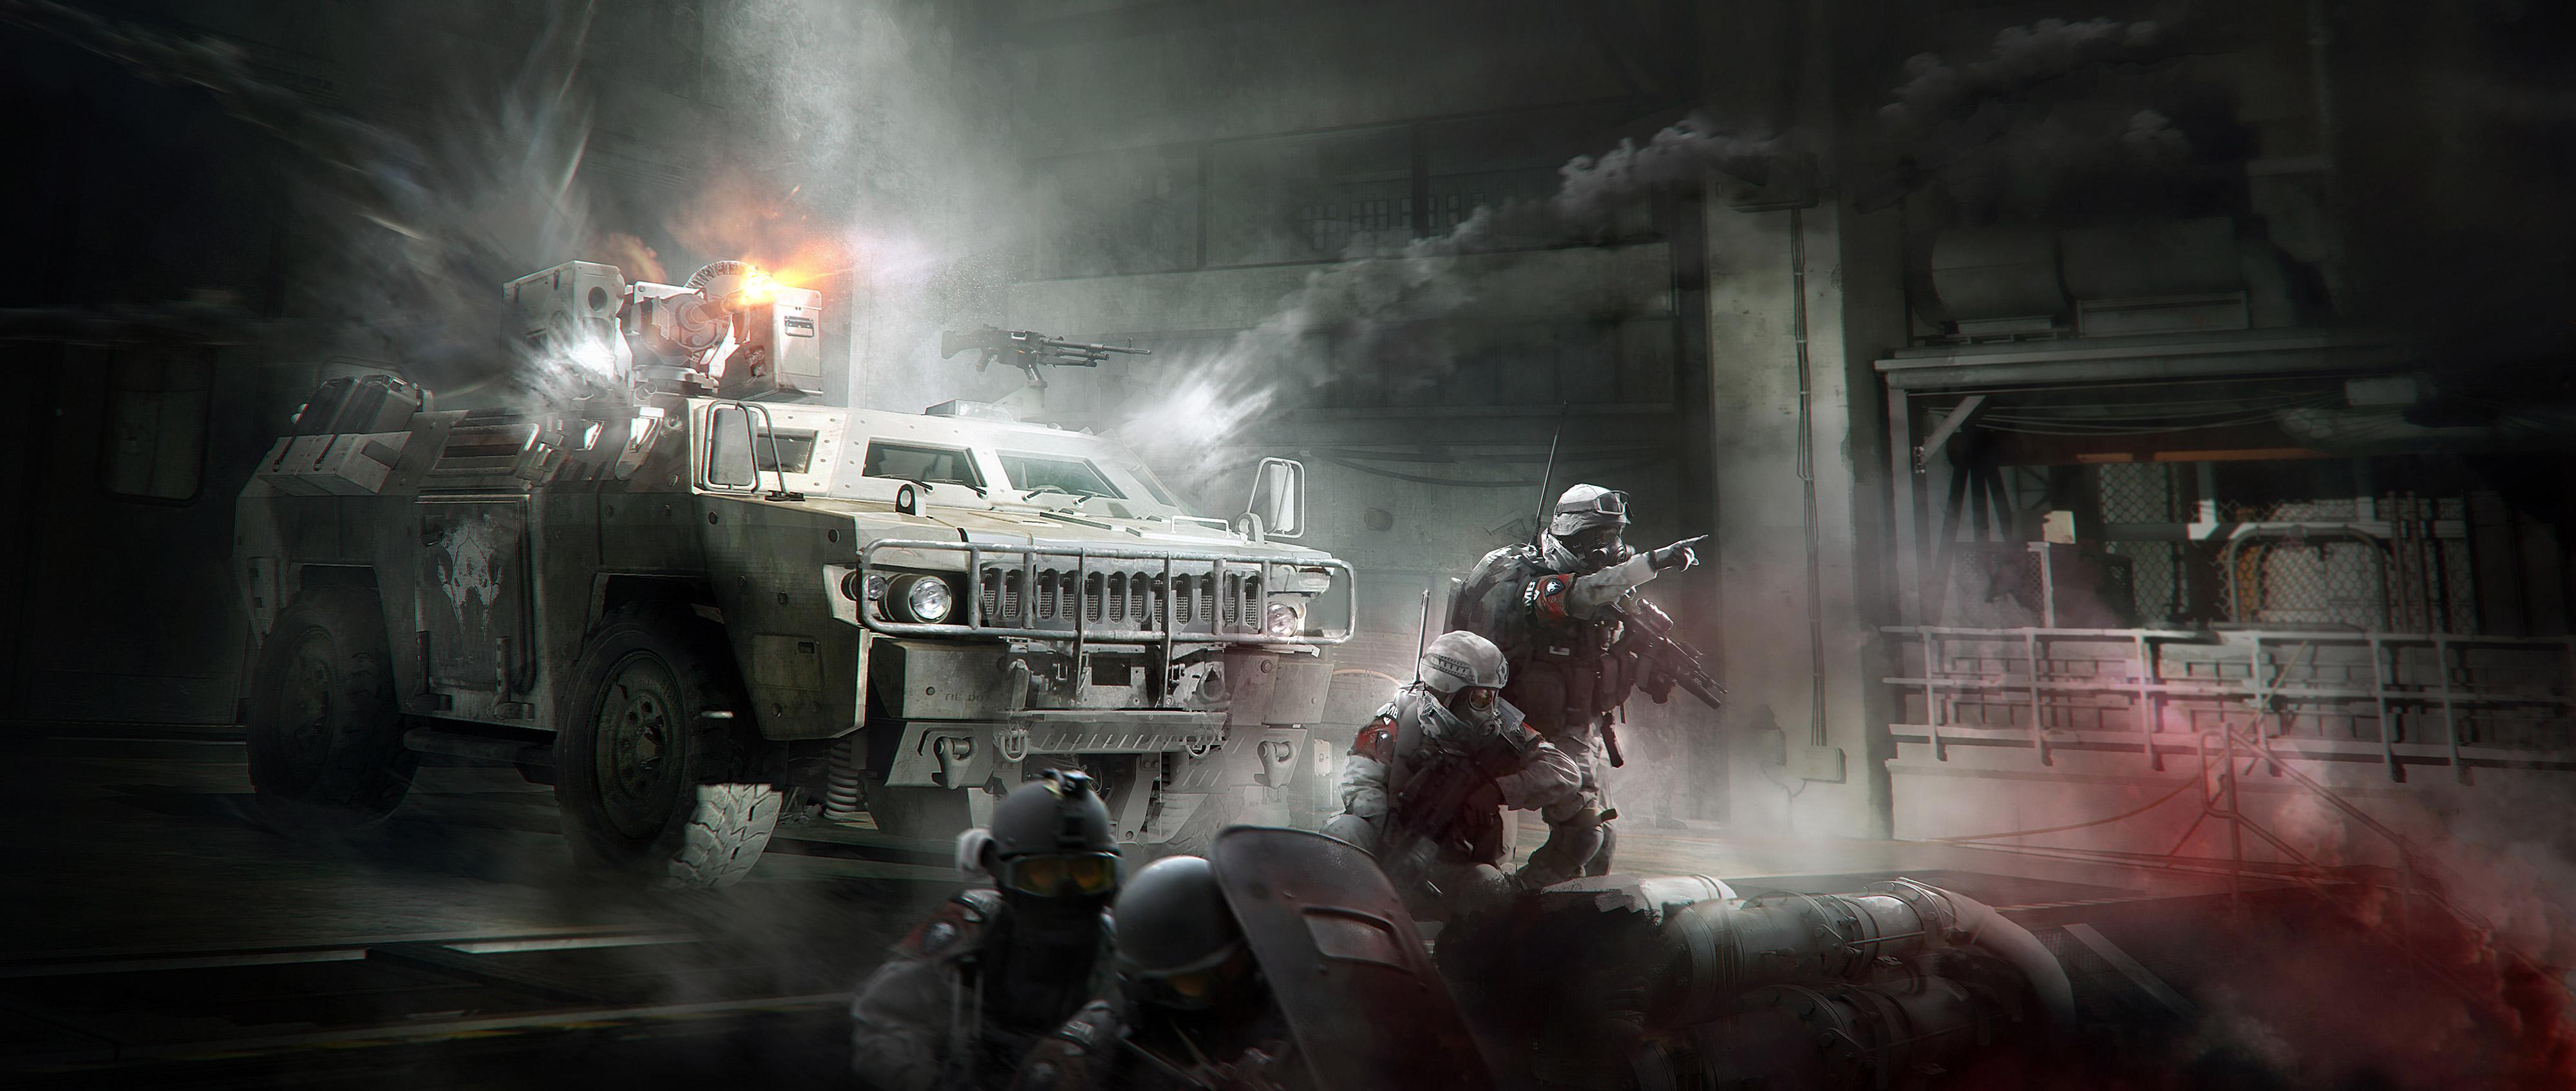 4k Tom Clancys Ghost Recon Wildlands, HD Games, 4k